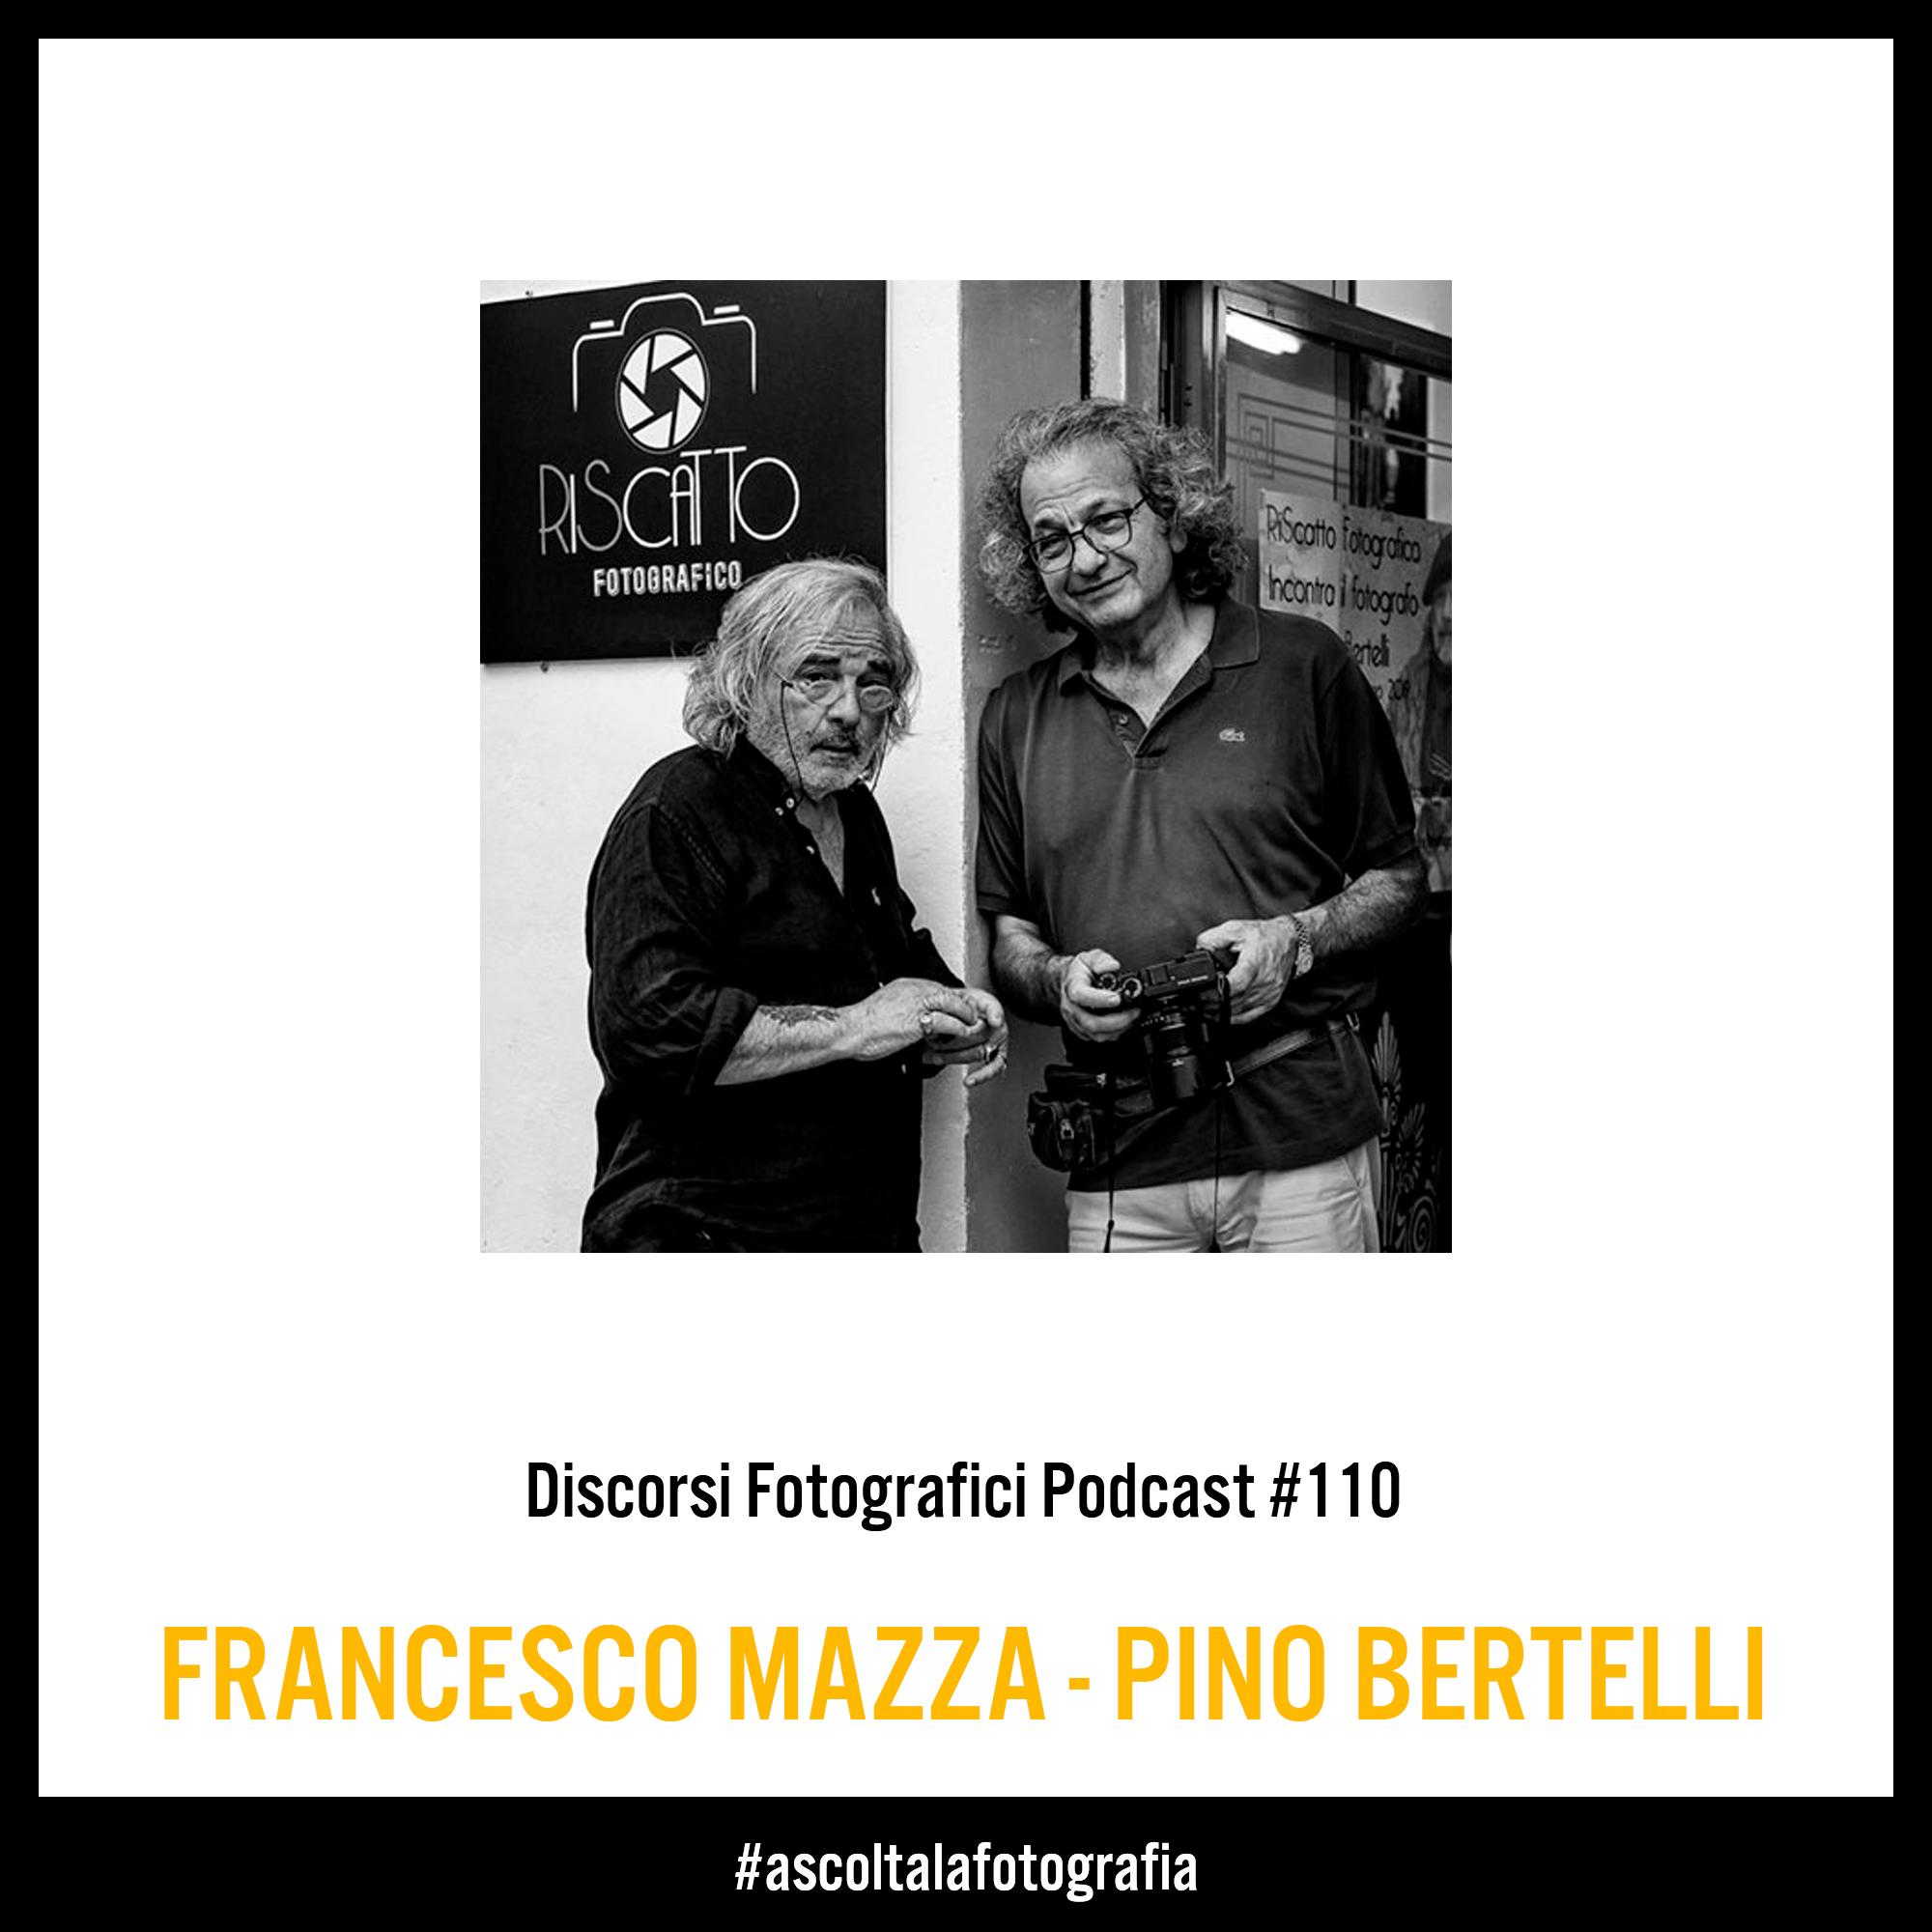 FRANCESCO MAZZA-PINO BERTELLI